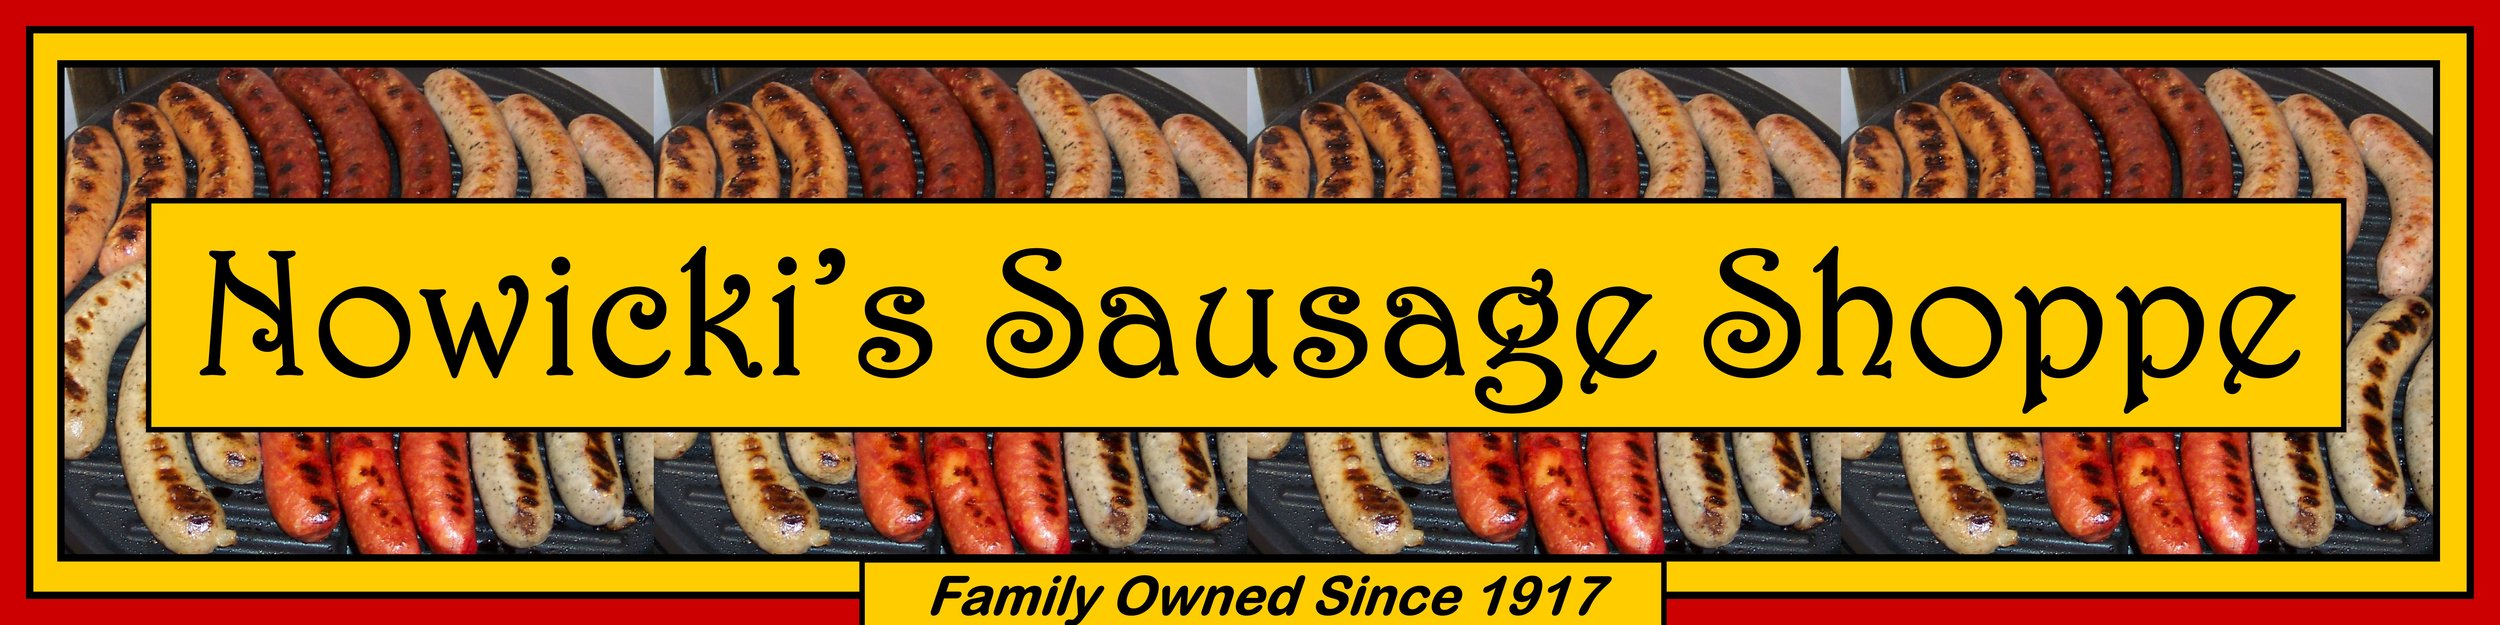 Nowicki's Sausage Shoppe - 1224 North 2nd AvenueAlpena, MI 49707(989) 354-2219